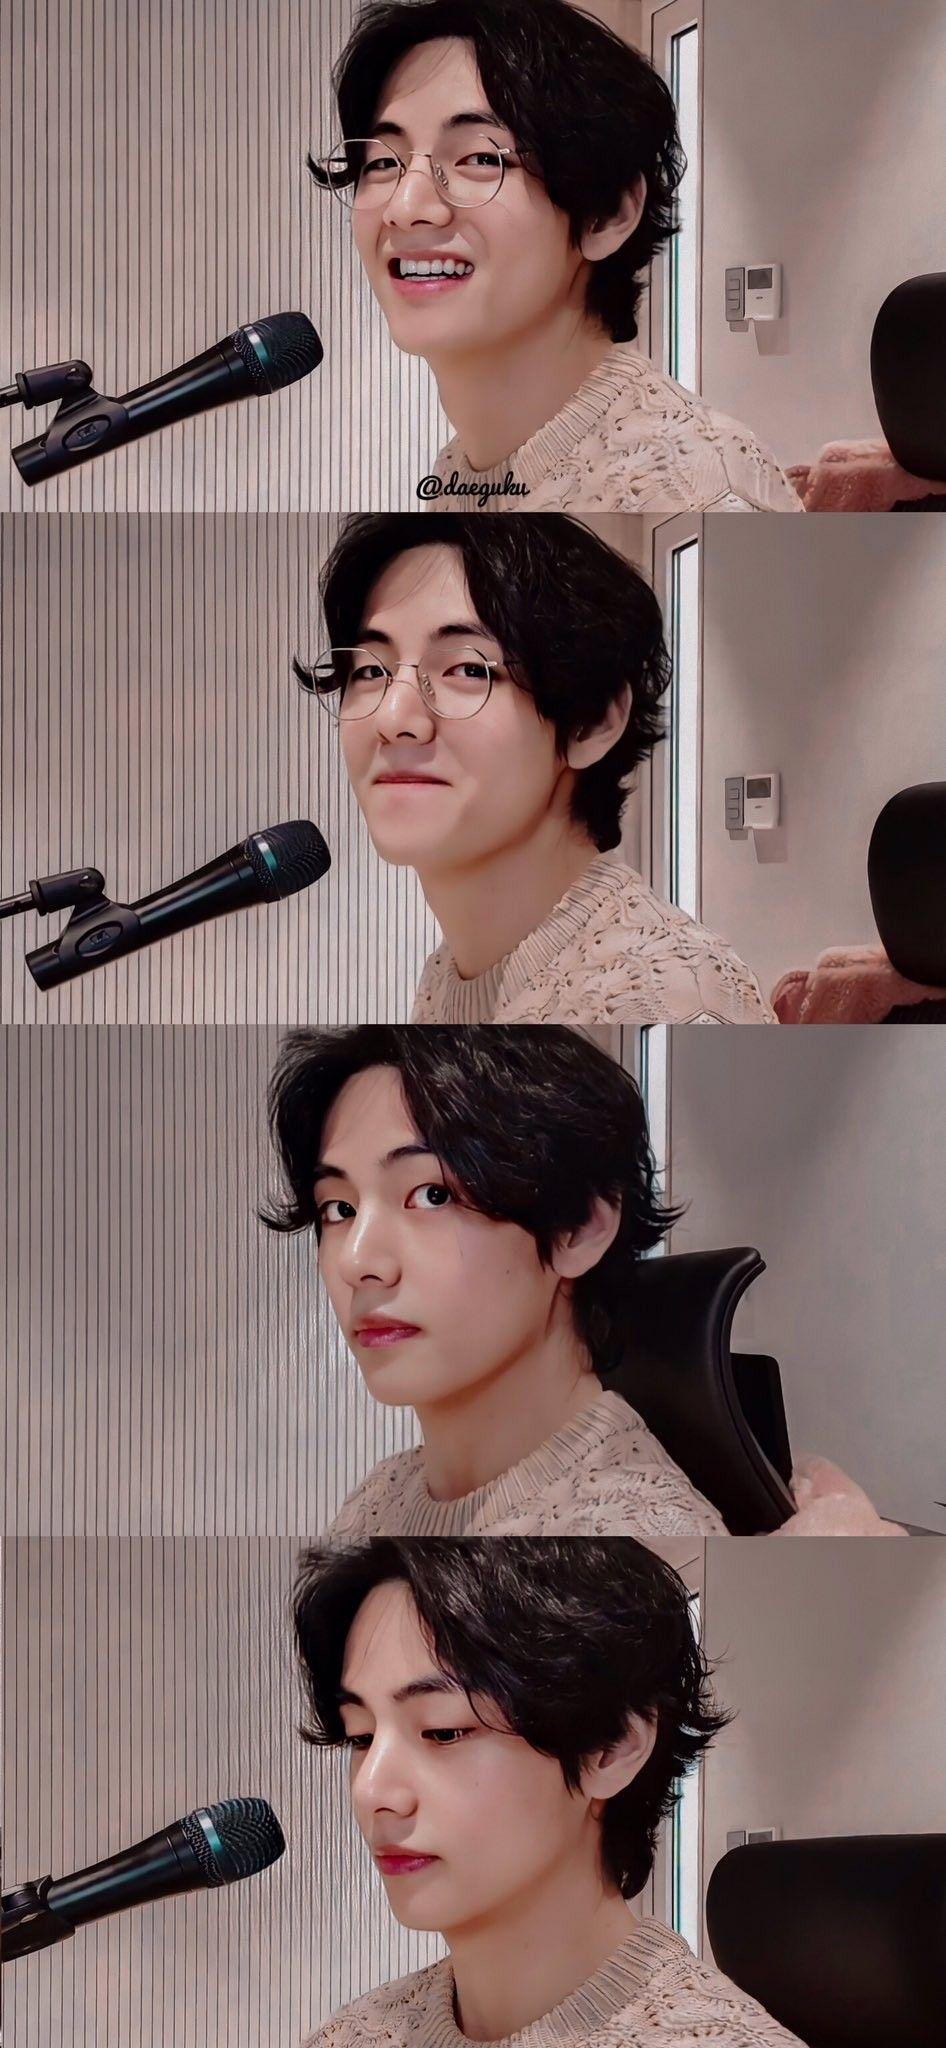 Pin By Anemis Arson On Taehyung Kim Taehyung Taehyung Bts Jungkook Bts taehyung vlive wallpaper